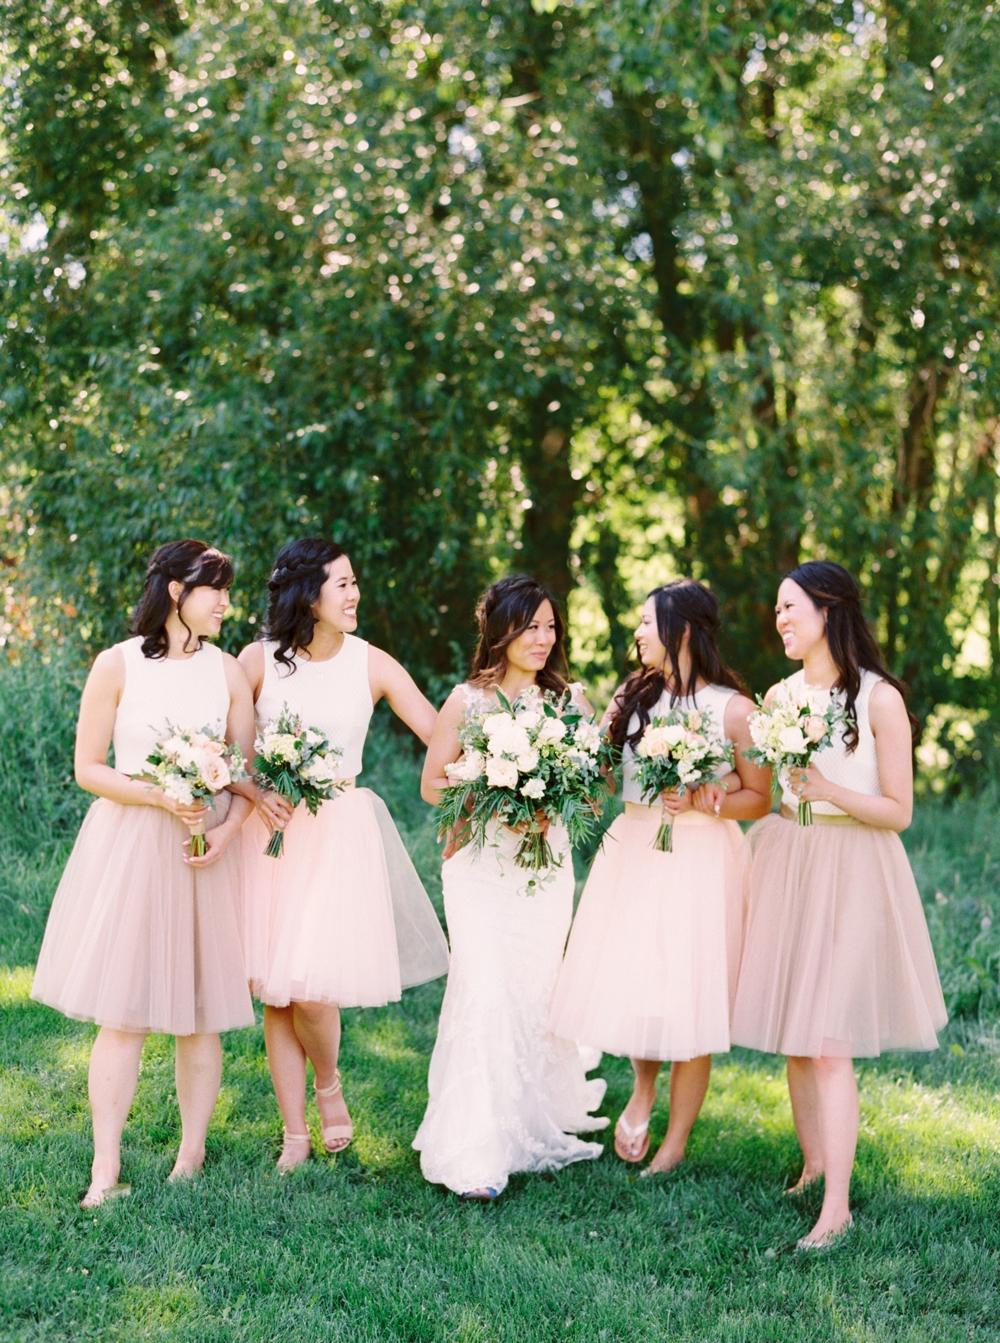 Calgary Wedding Photographer | Meadow Muse Pavilion Wedding | Canmore Photographers | Fish Creek Park | Bridesmaids crop top & skirt